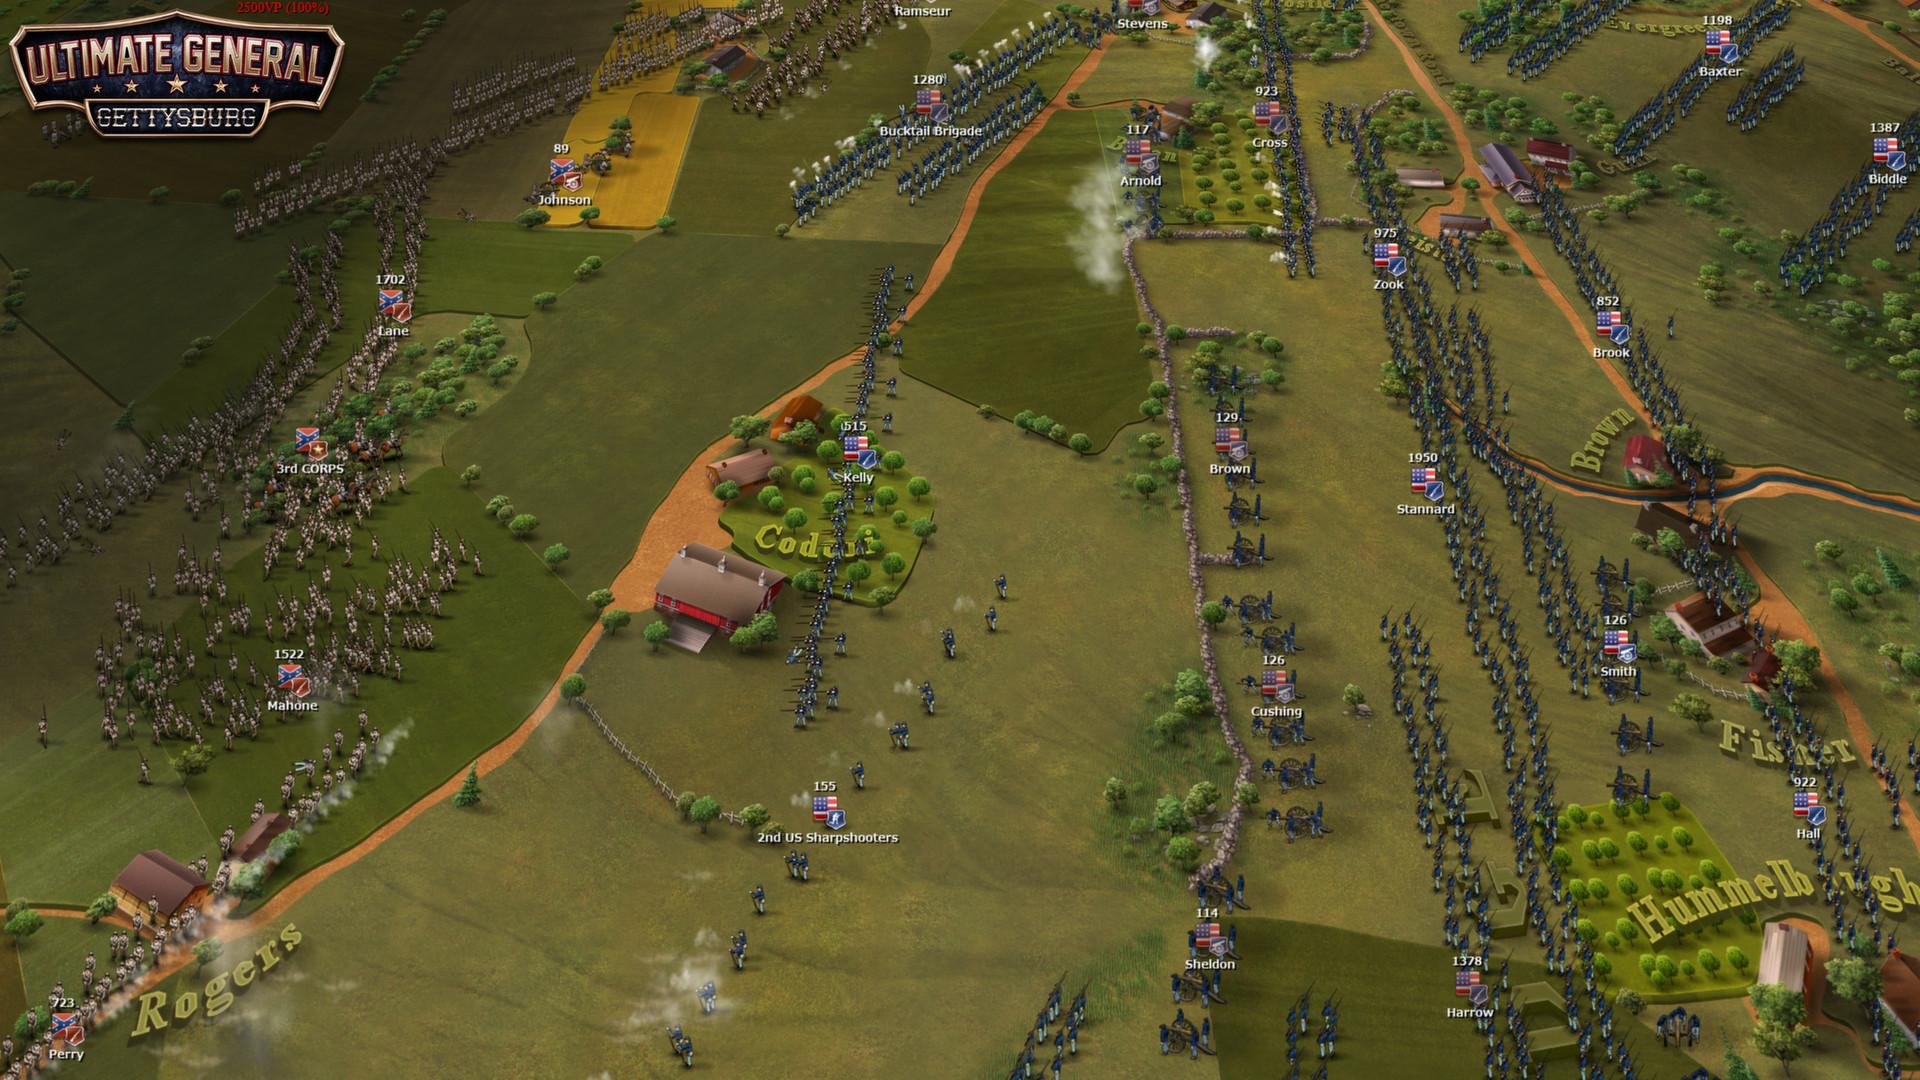 Ultimate General Gettysburg скачать торрент